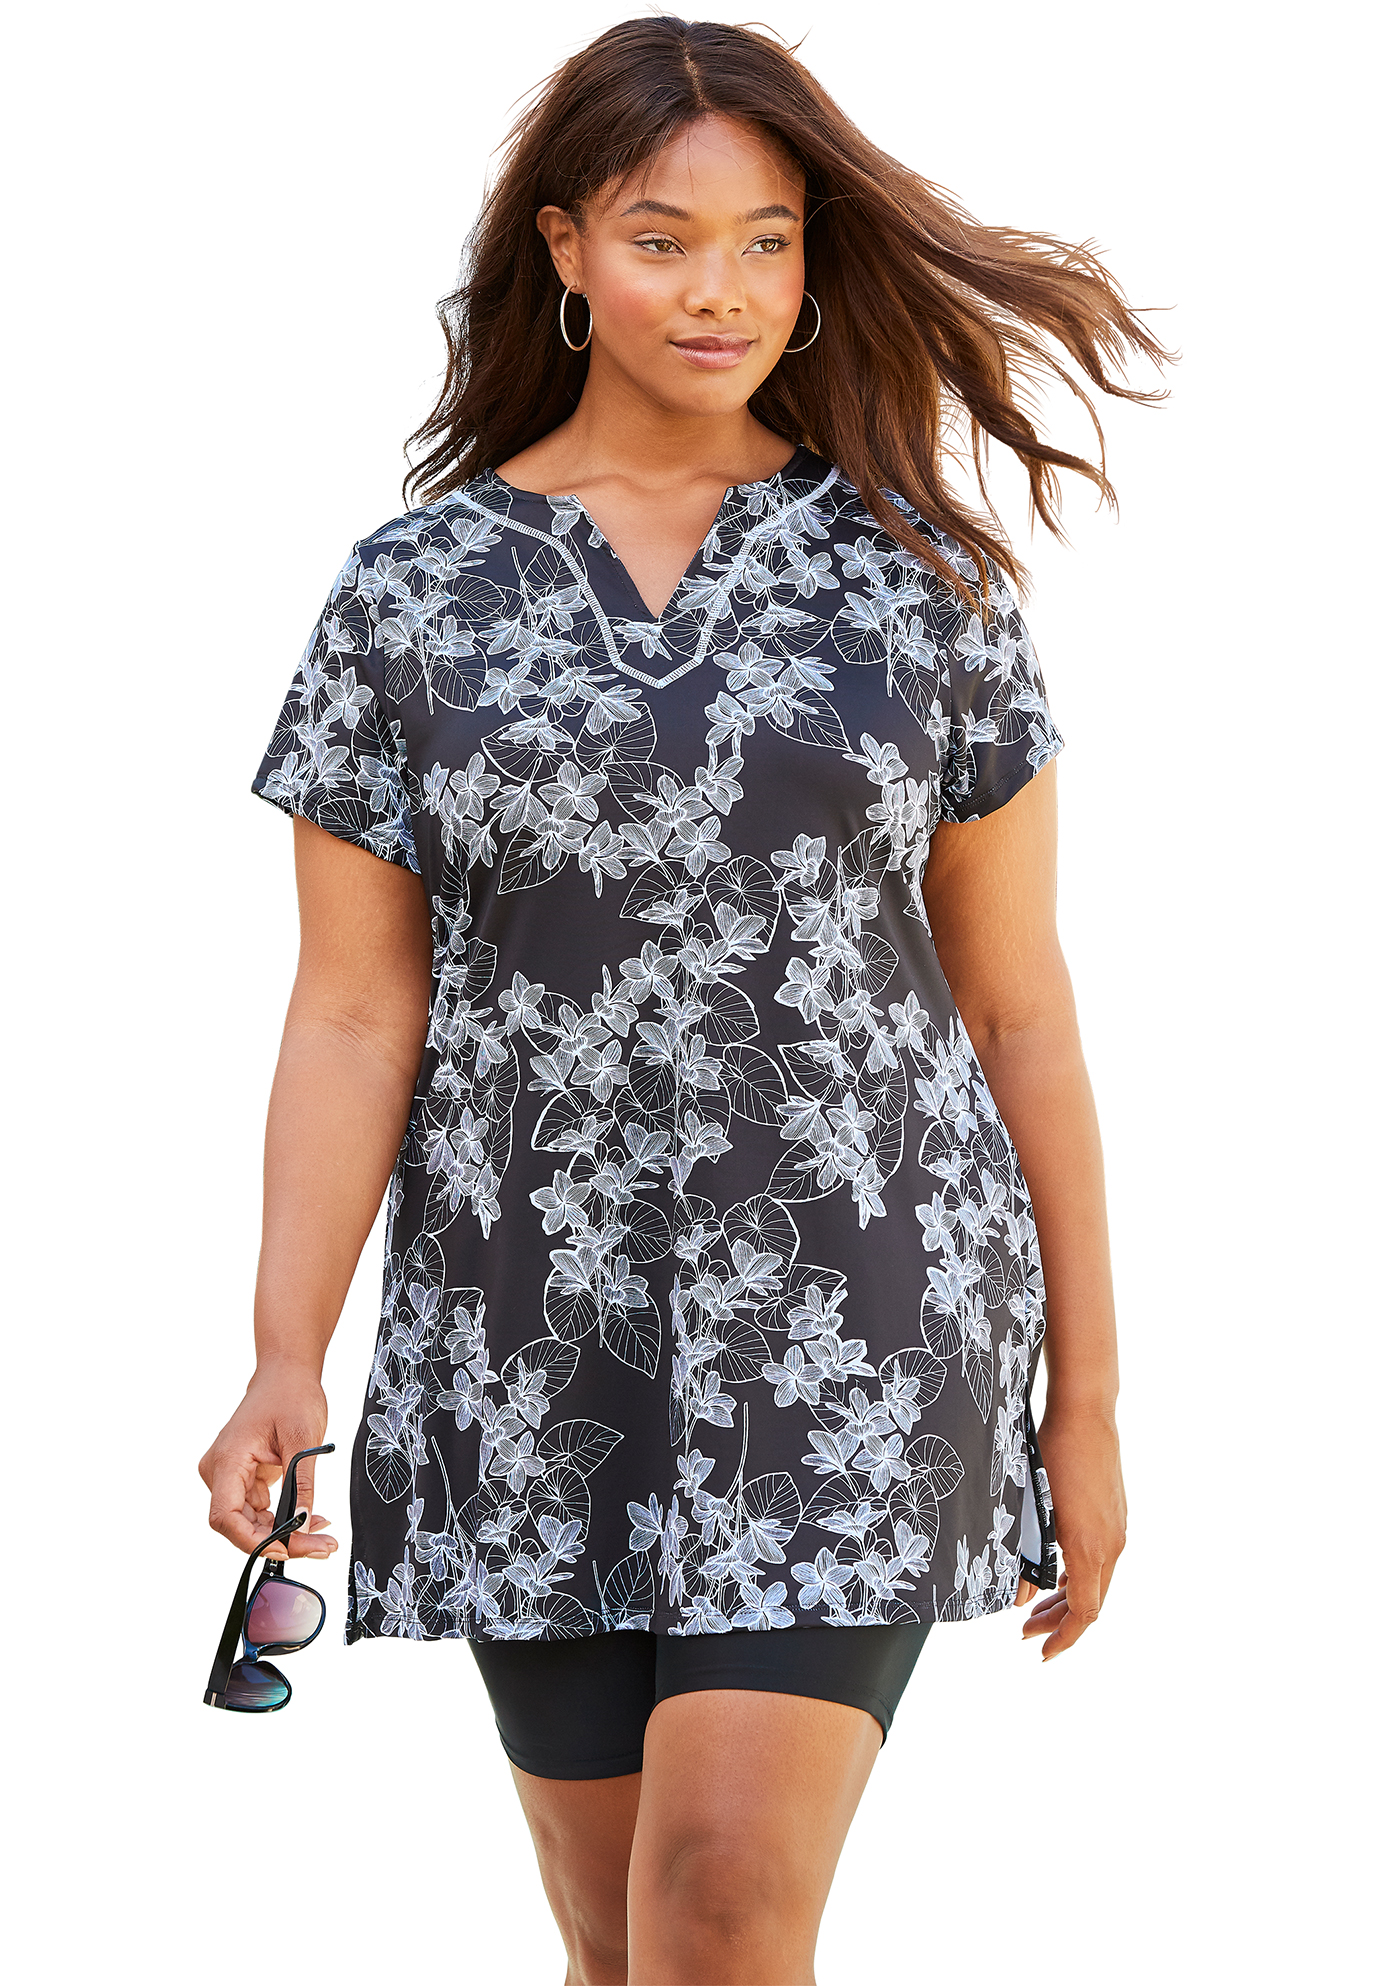 Plus Size Women's Longer Length Short-Sleeve Swim Tunic by Swim 365 in Black White Stencil Floral